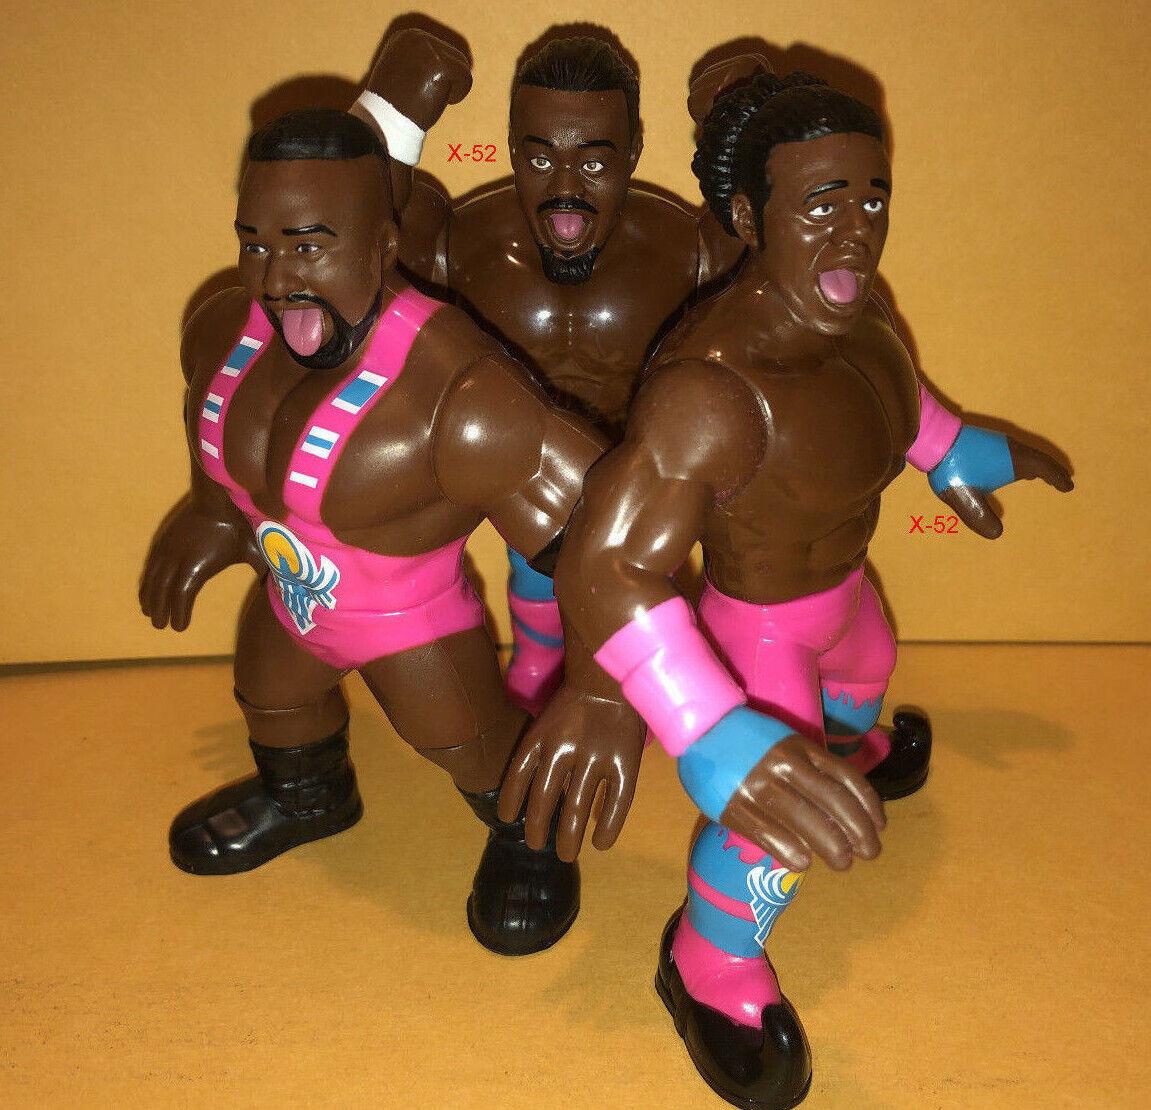 WWE RETRO 3 figure lot BIG E + kofi KINGSTON + xavier WOODS toy THE NEW DAY wwf